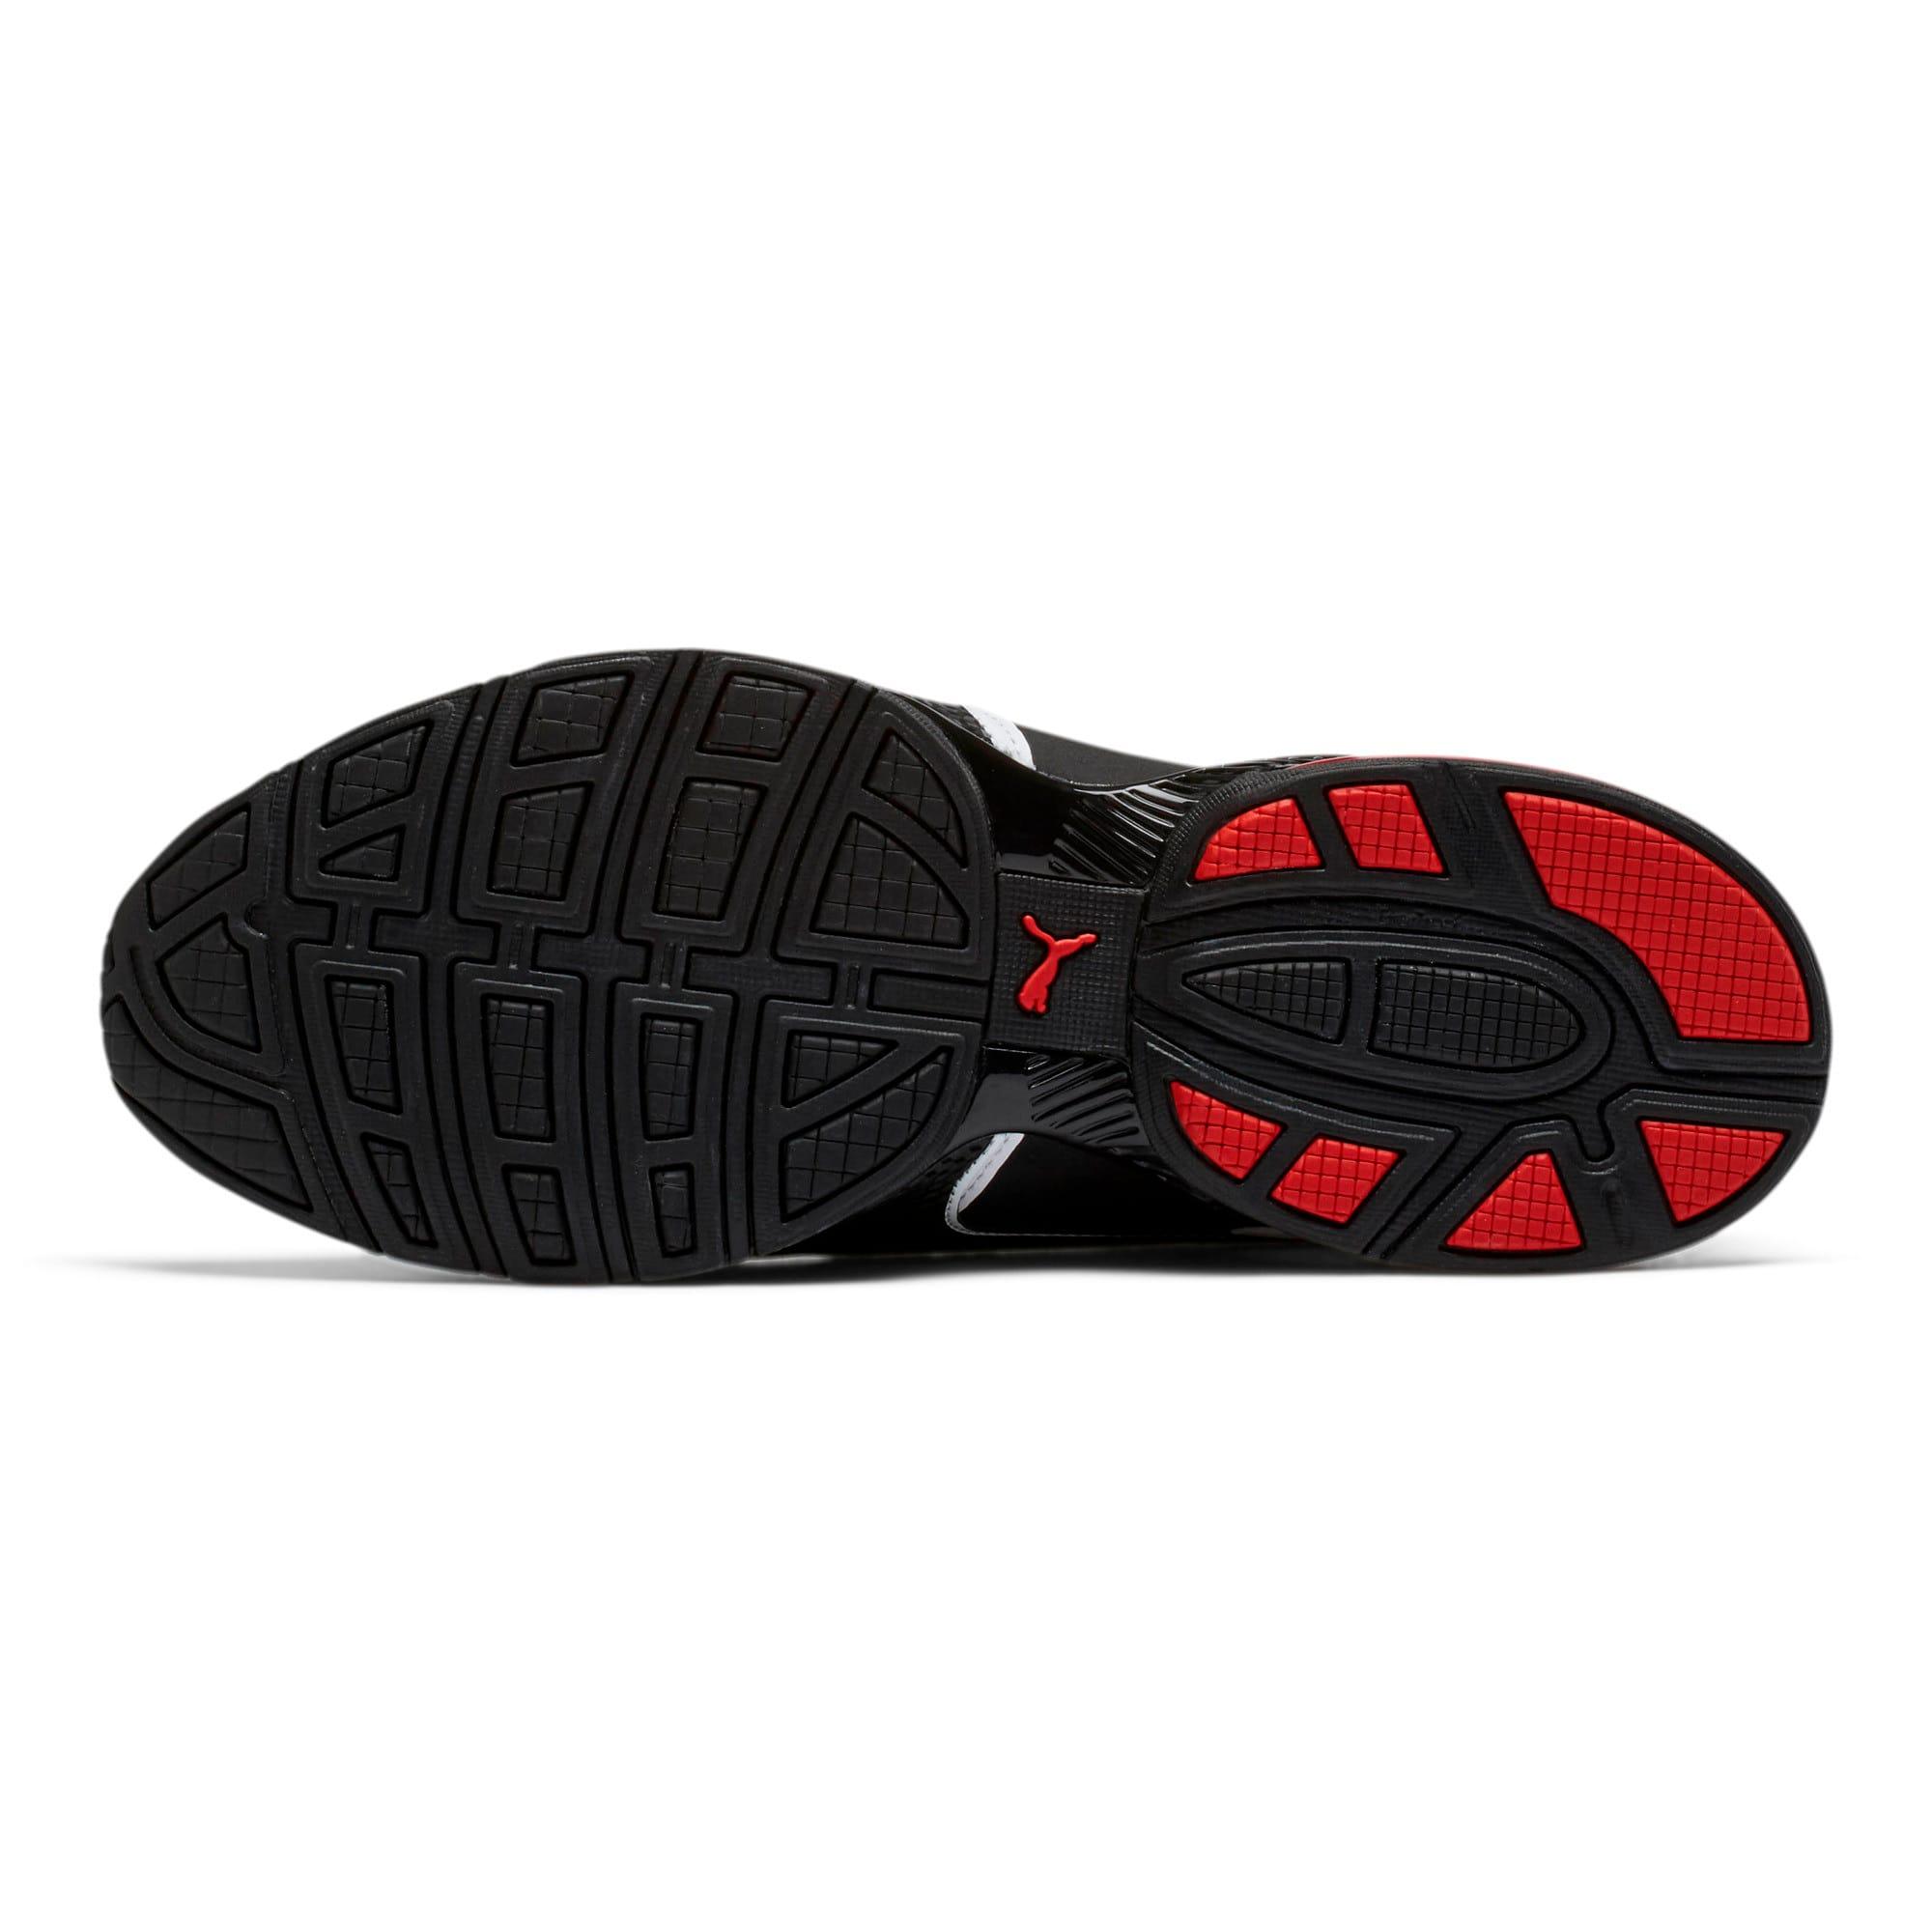 Thumbnail 4 of CELL Surin 2 FM Men's Running Shoes, White-Black-flame scarlet, medium